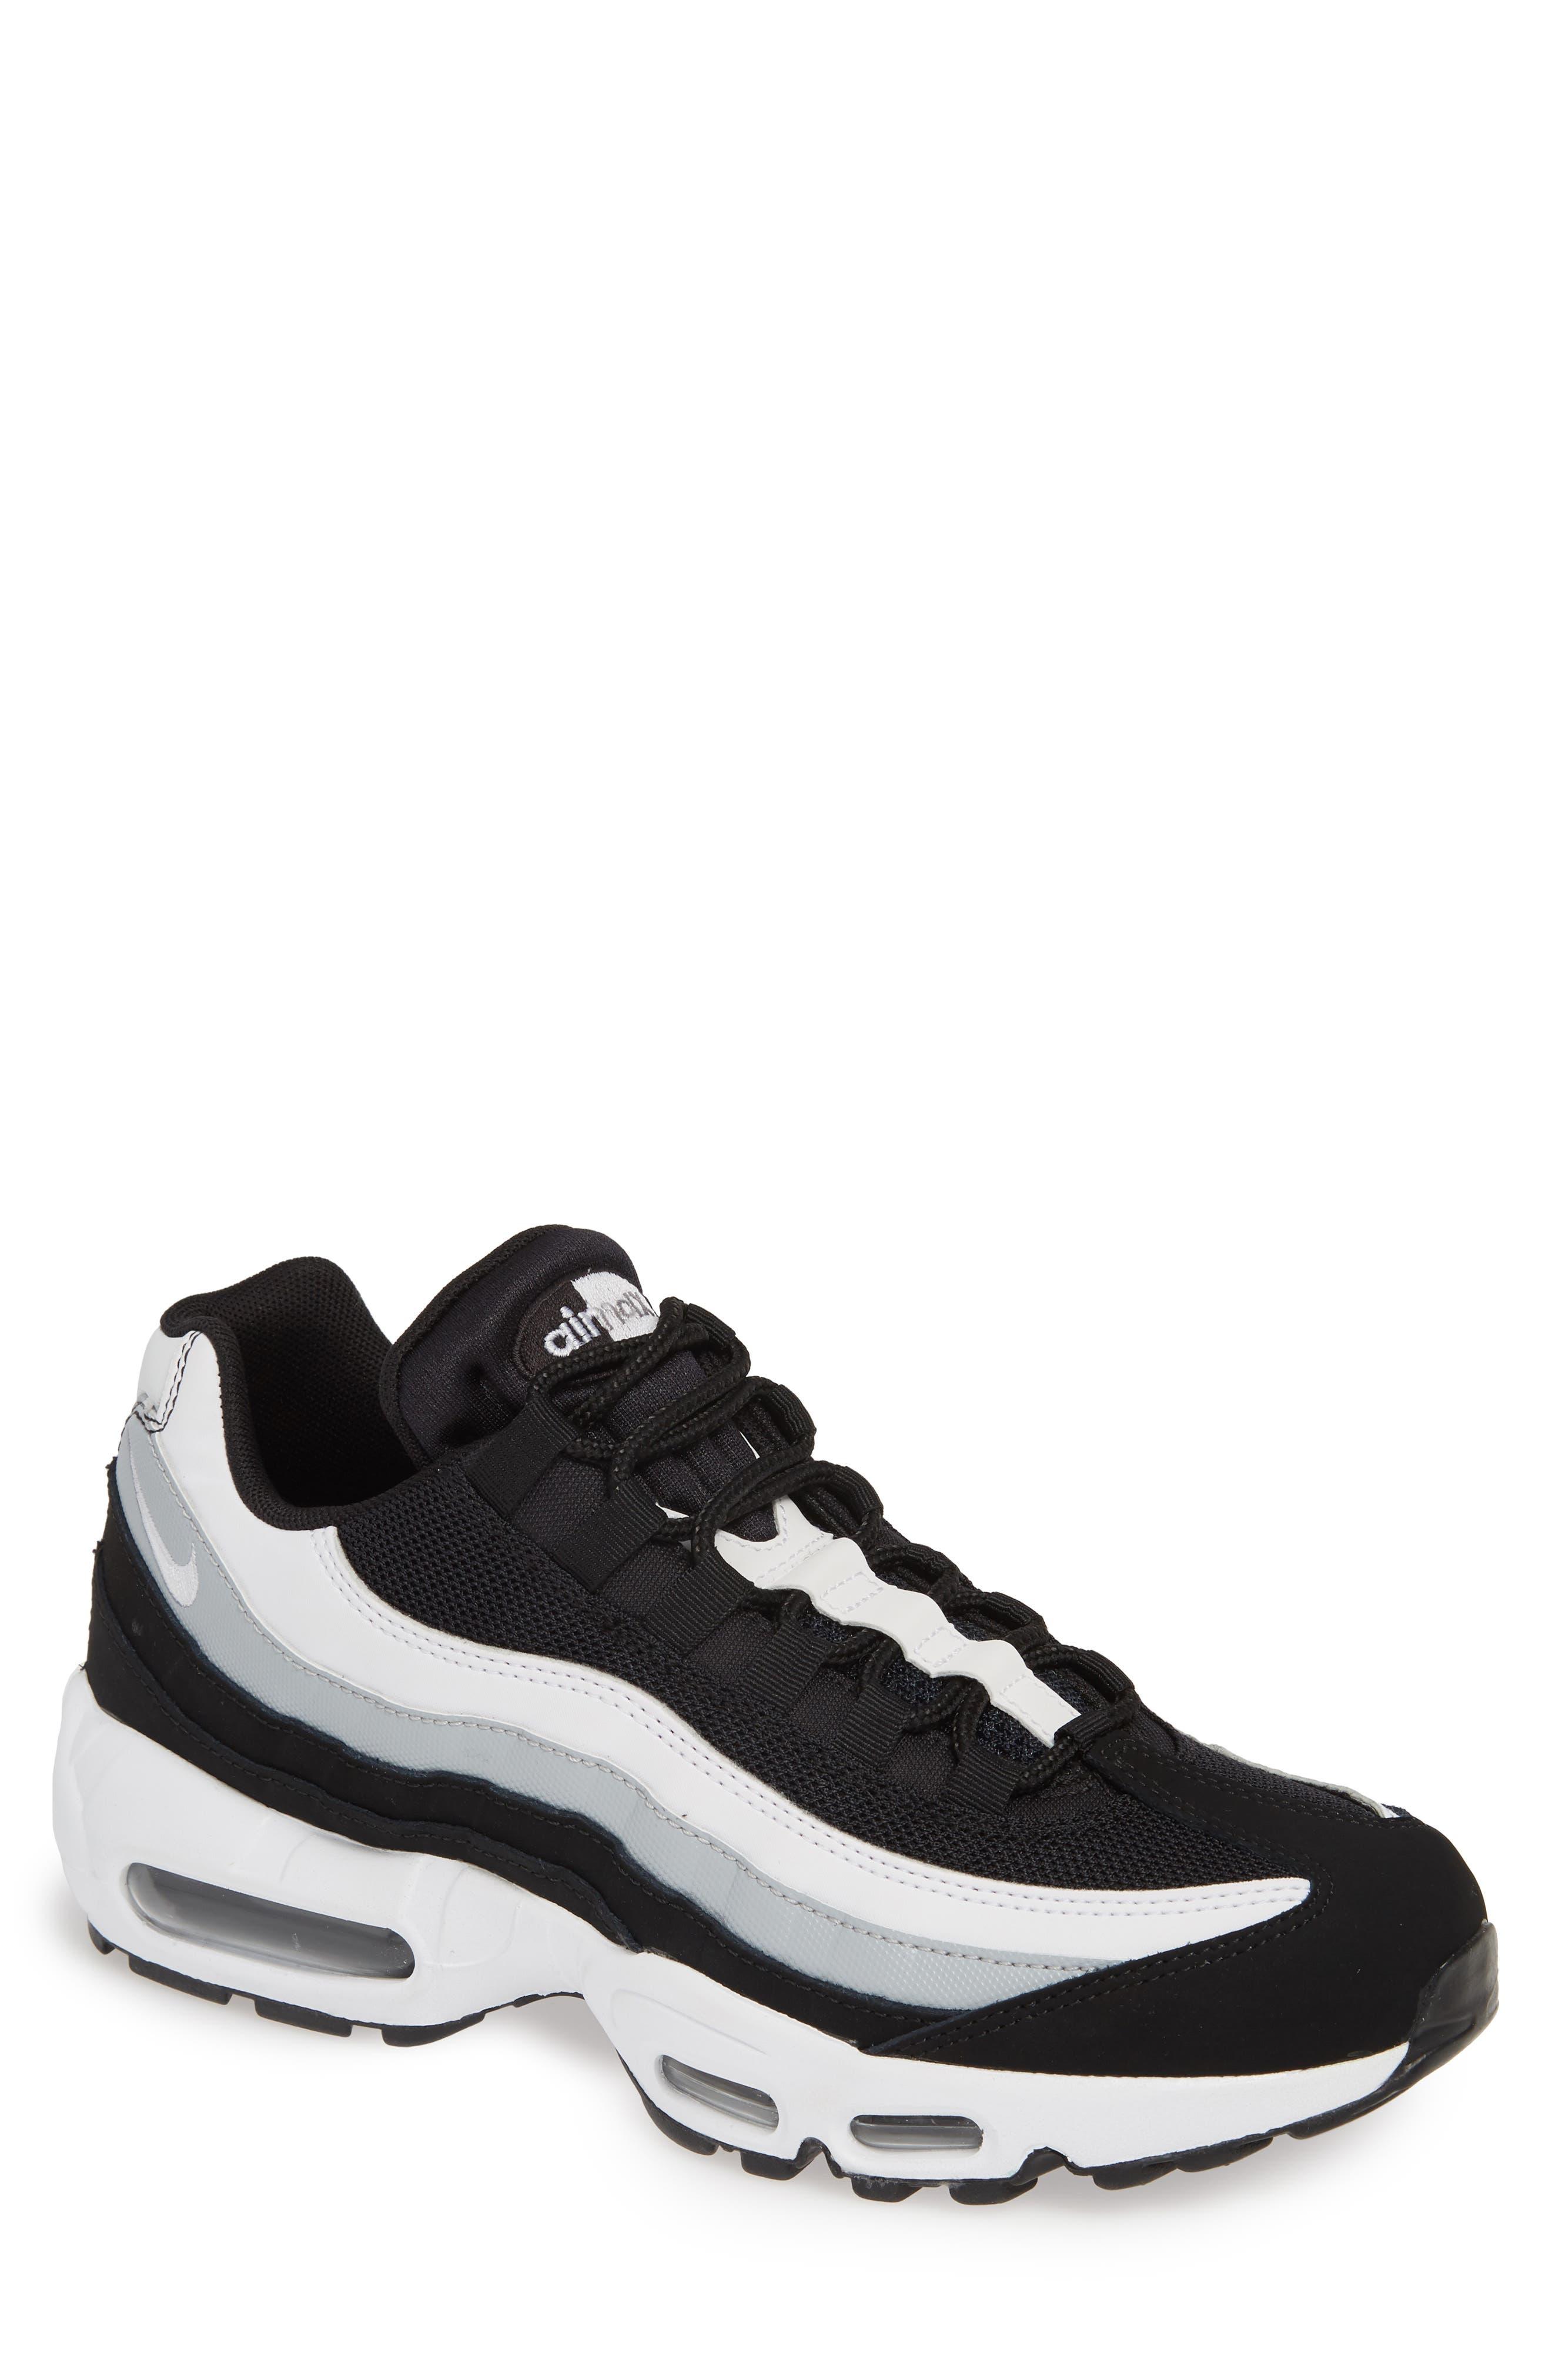 Metallic Gold Nike Dunk Wedges Sneakers Nike Free V4 5.0 Black And ... 6103020c69